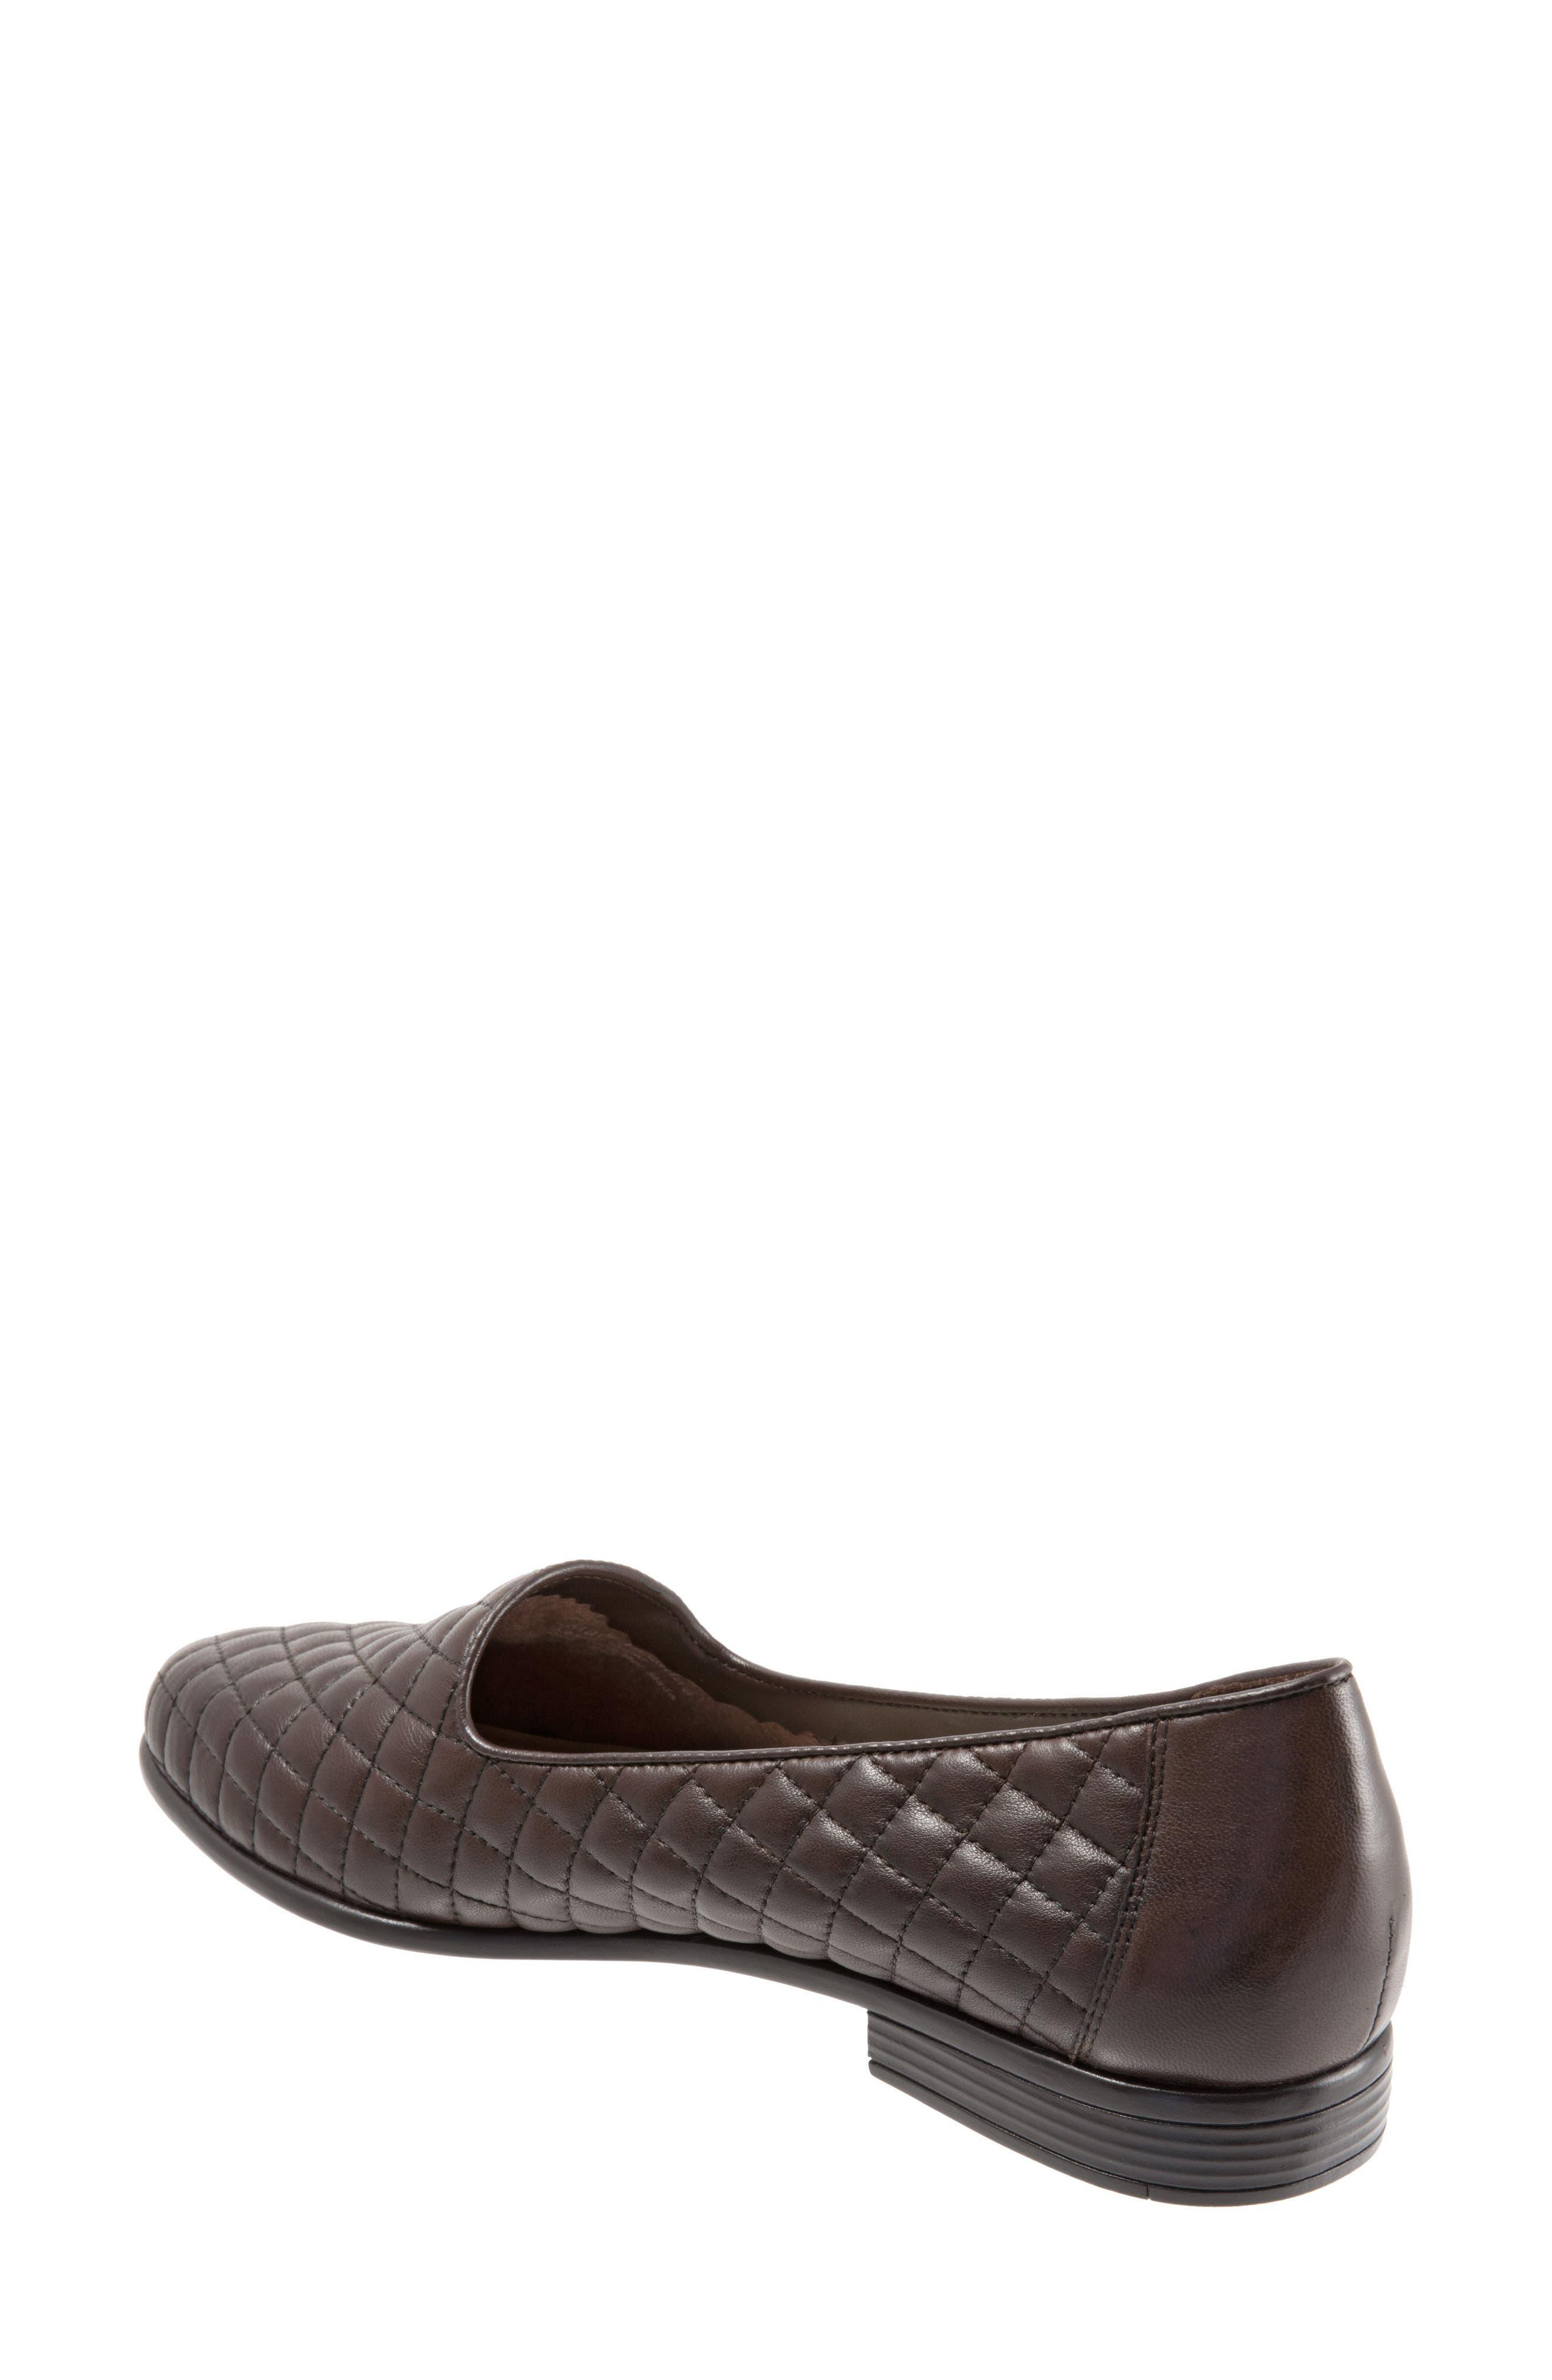 Liz Woven Loafer Flat,                             Alternate thumbnail 2, color,                             Dark Brown Leather